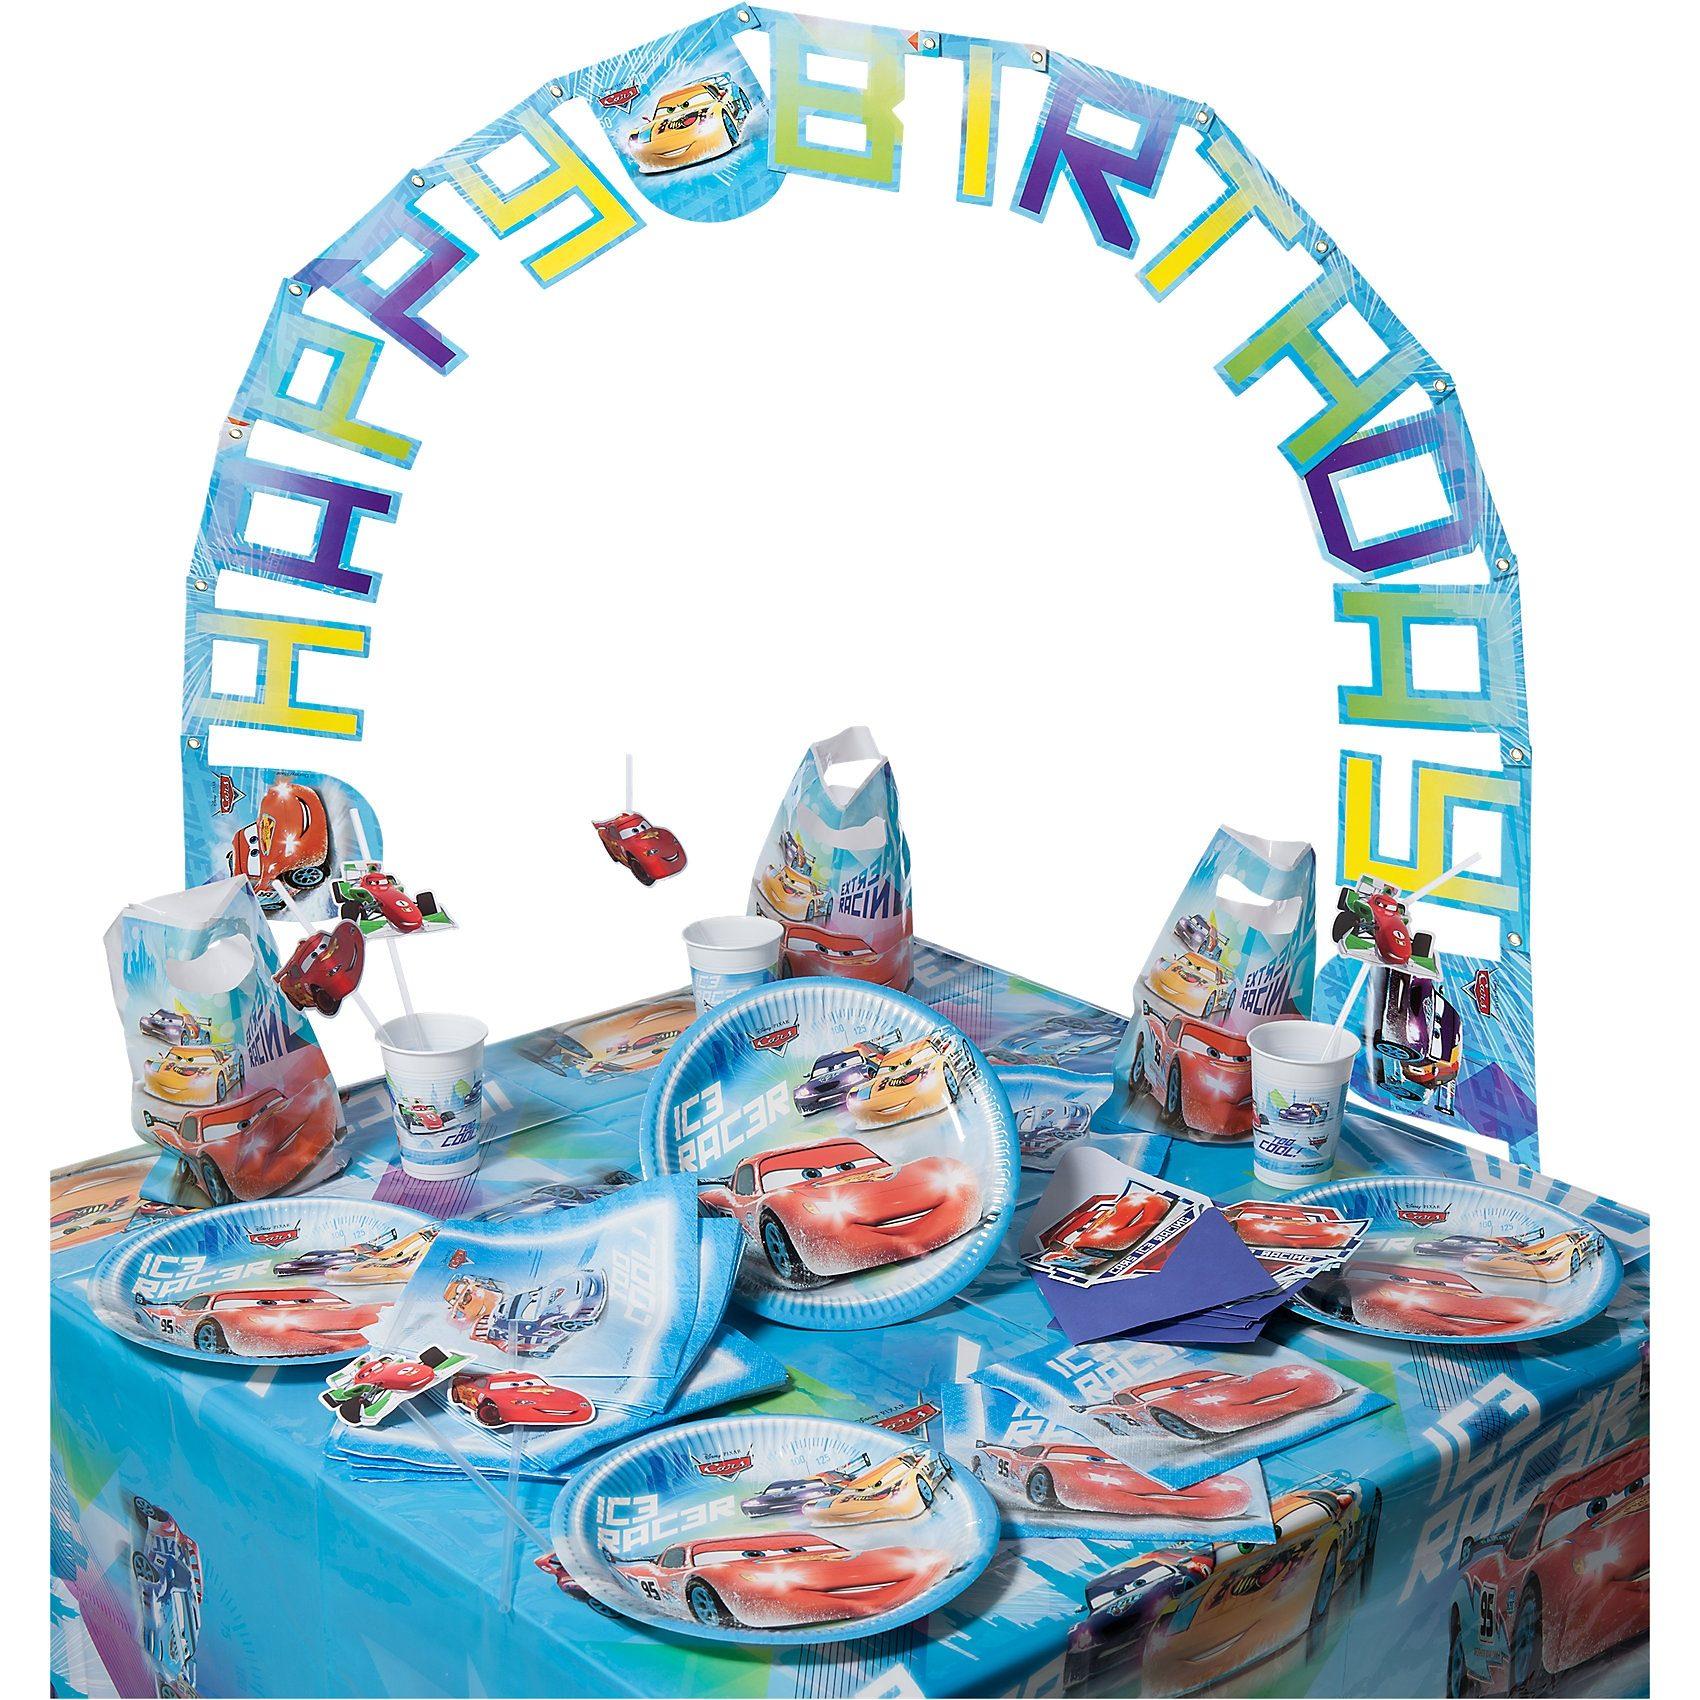 Procos Partyset Disney Cars Ice, 56-tlg.